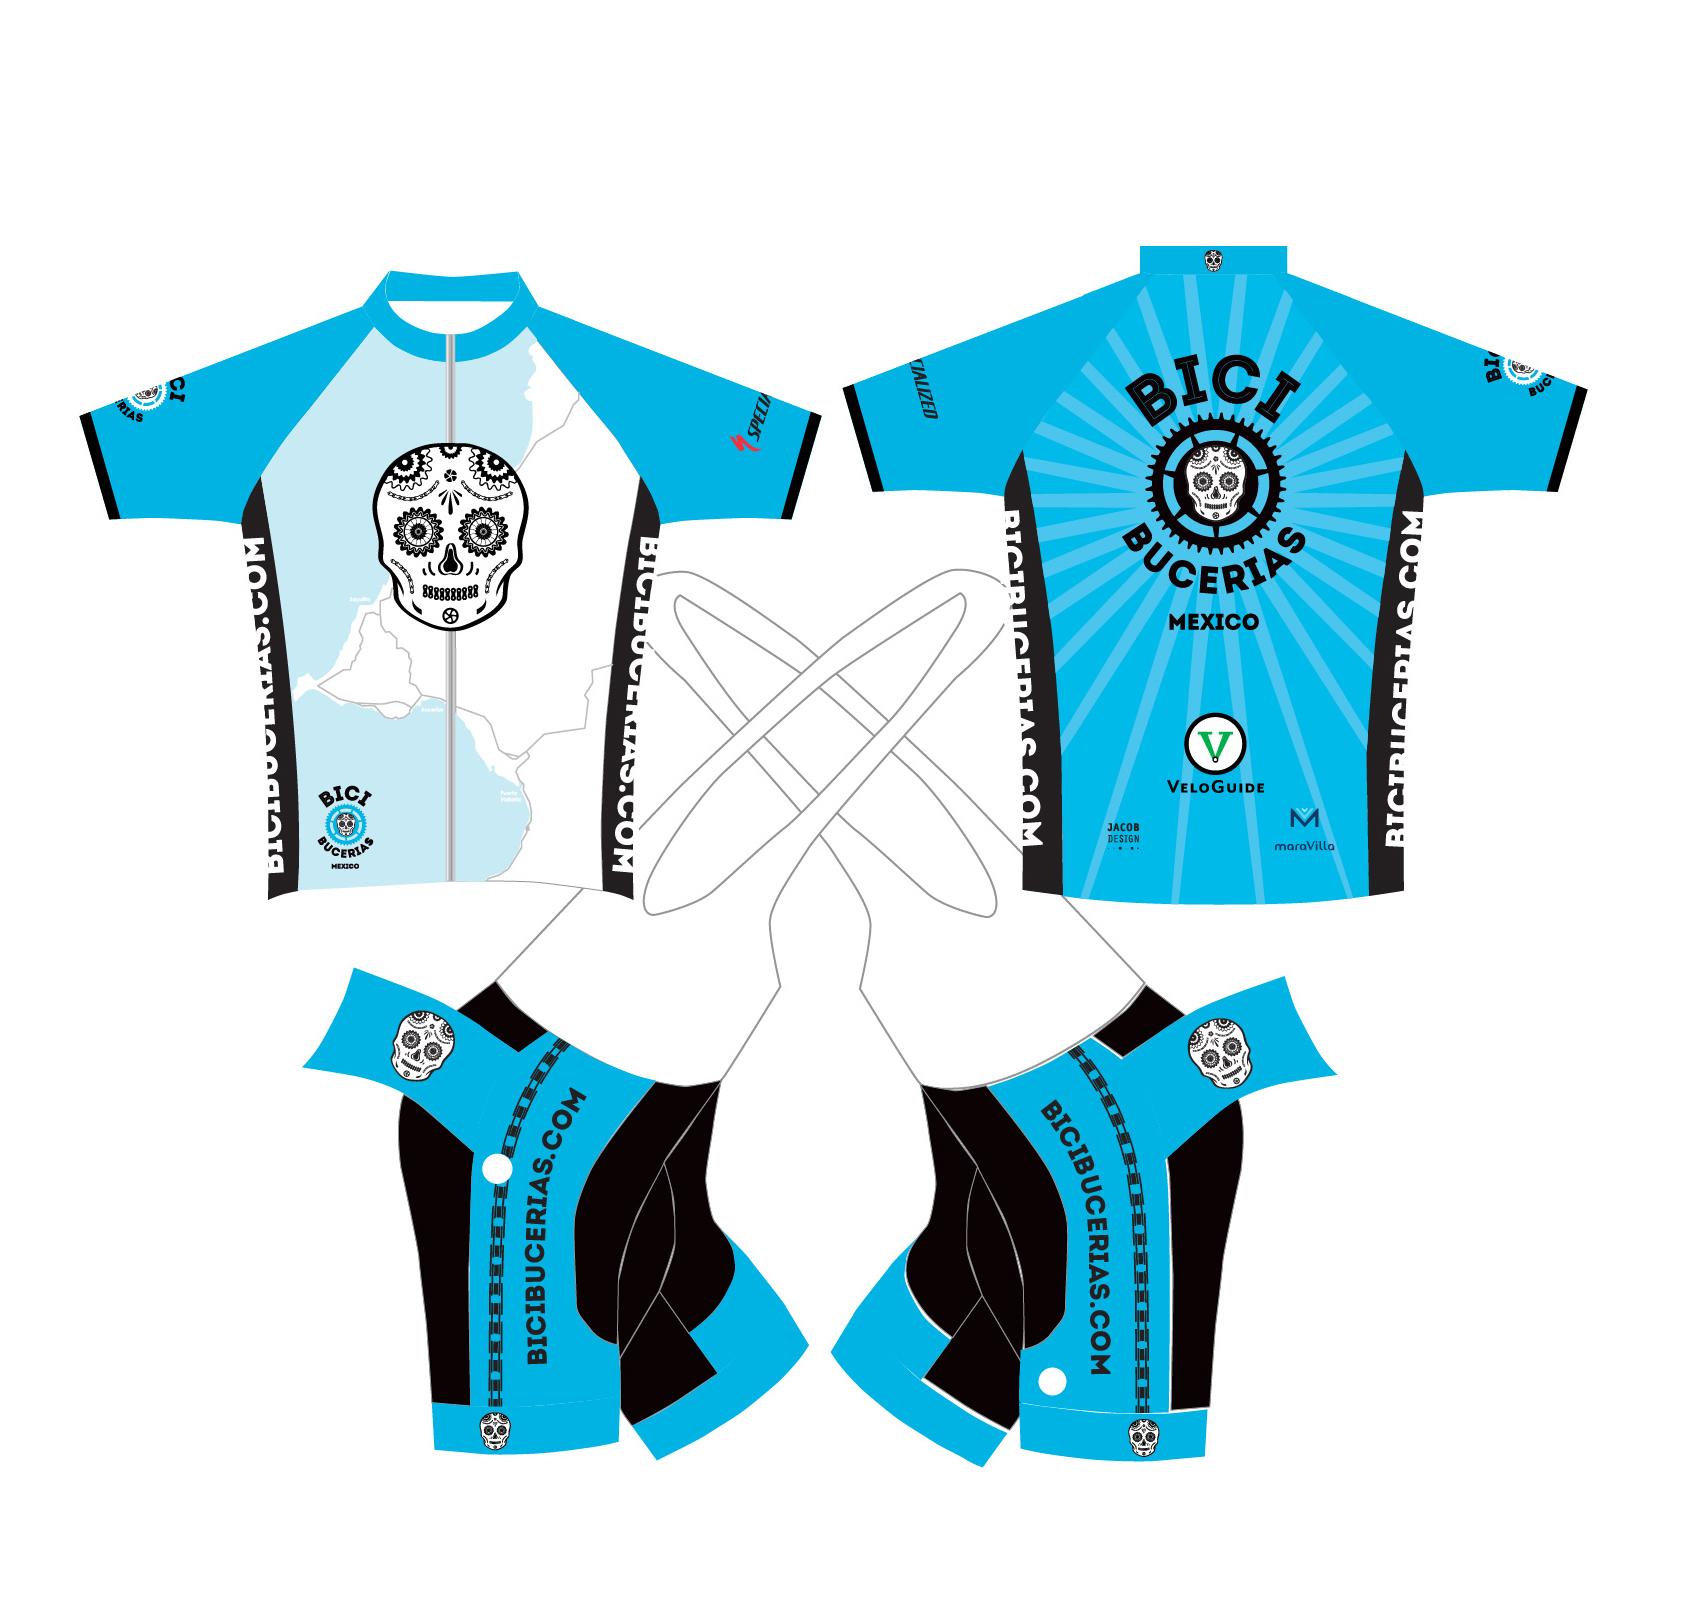 BiciBucerias2017_jersey_Azul_7Feb17_site.jpg